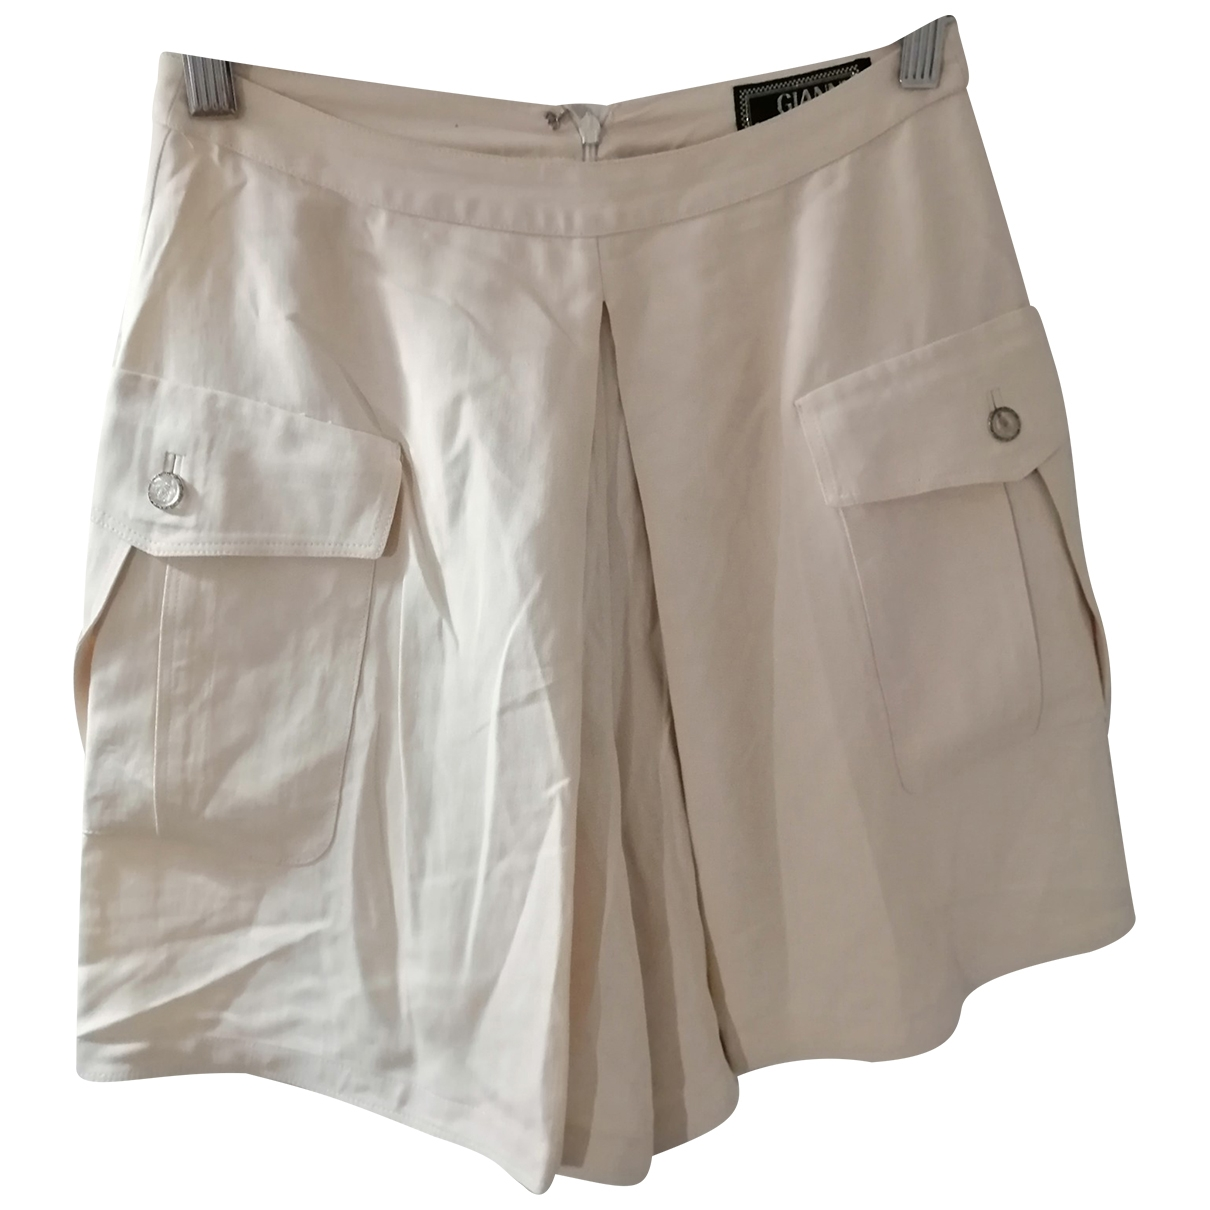 Gianni Versace \N Beige Silk Shorts for Women 36 FR